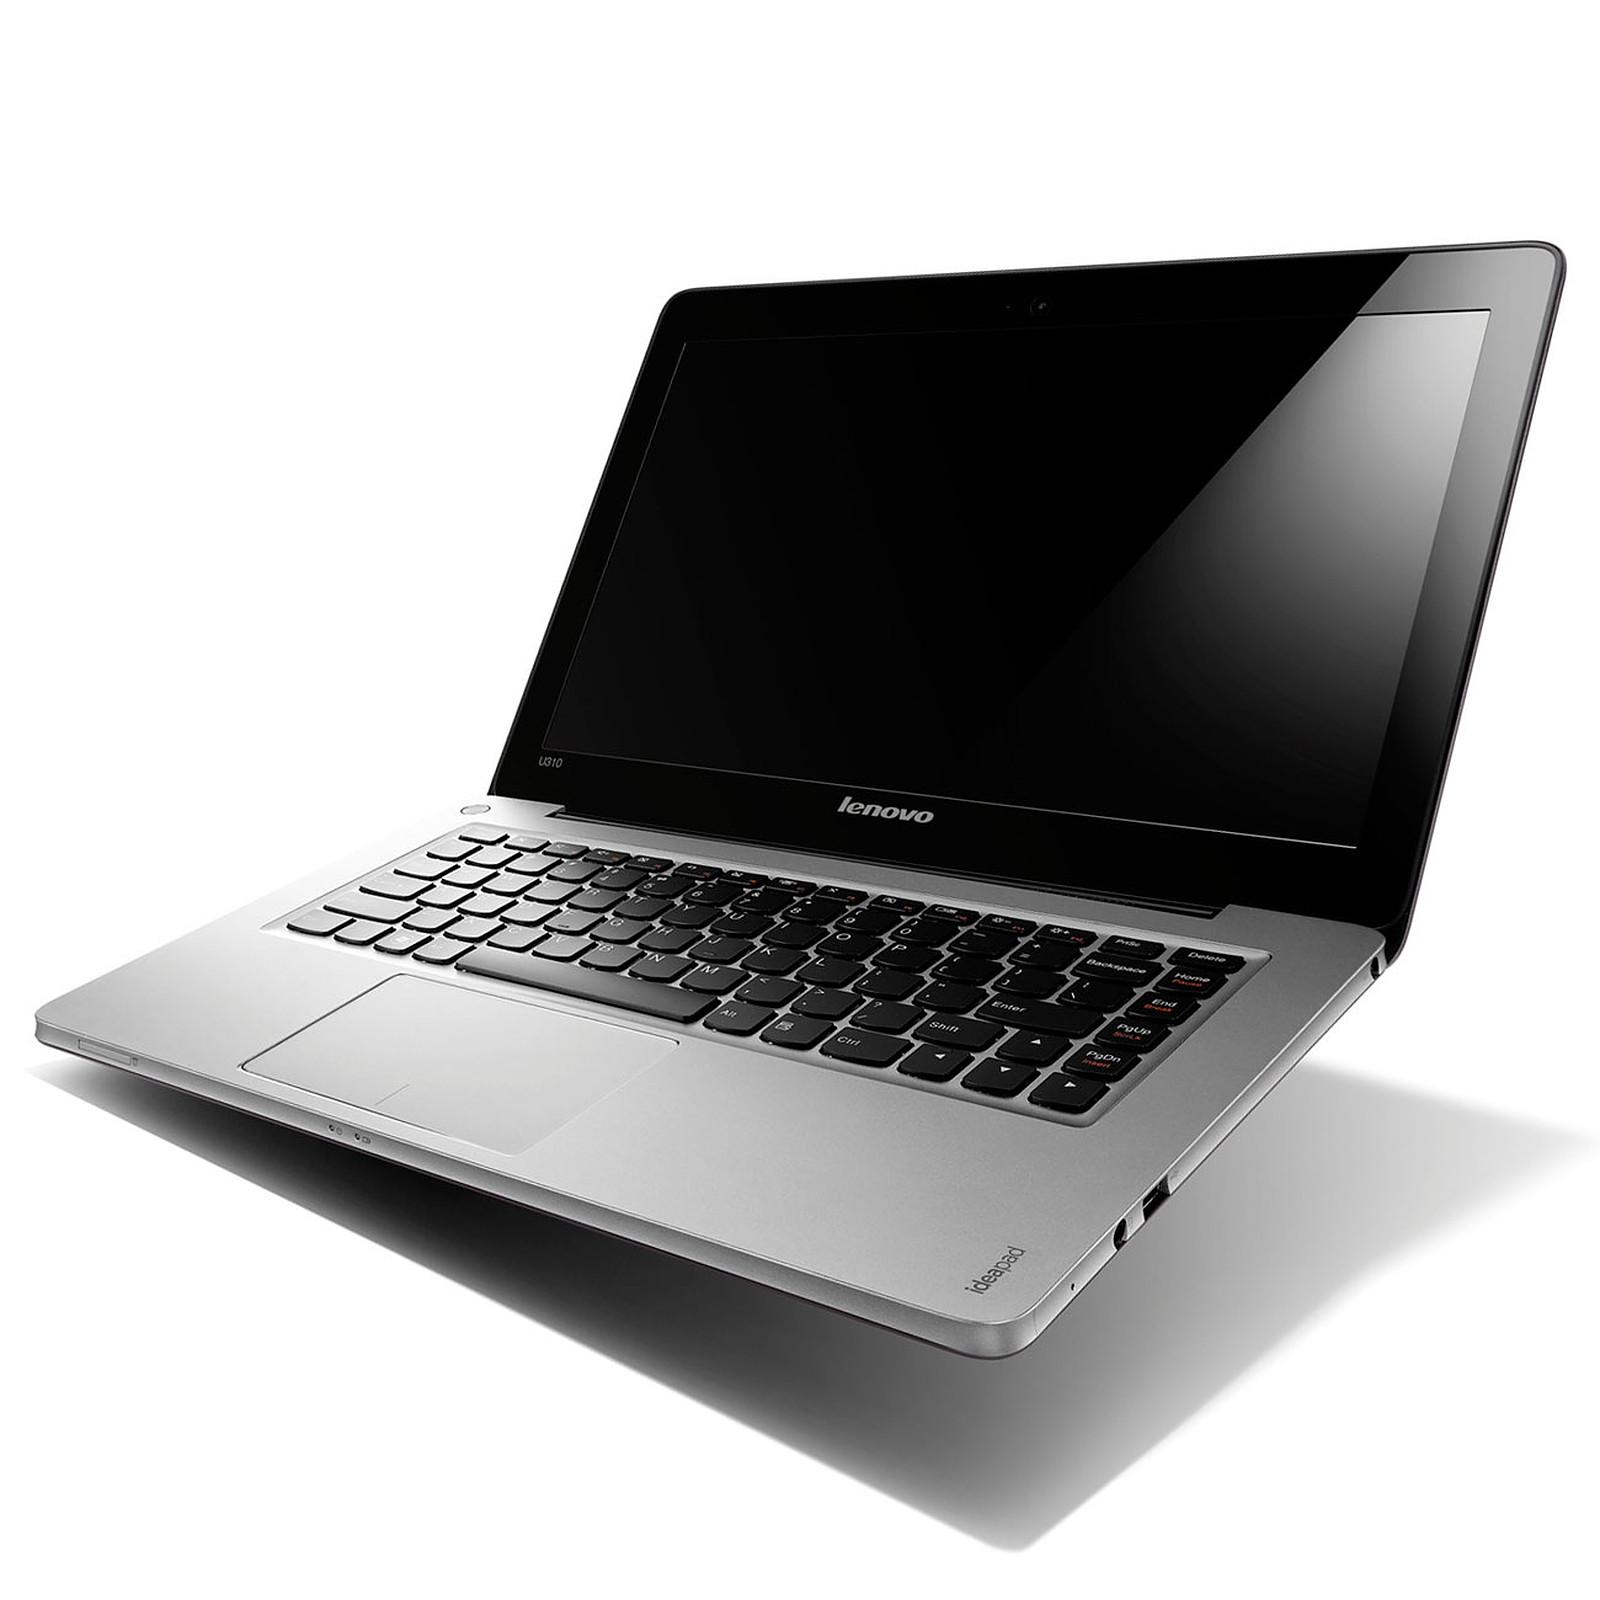 Lenovo IdeaPad U310 Touch (MB662FR)